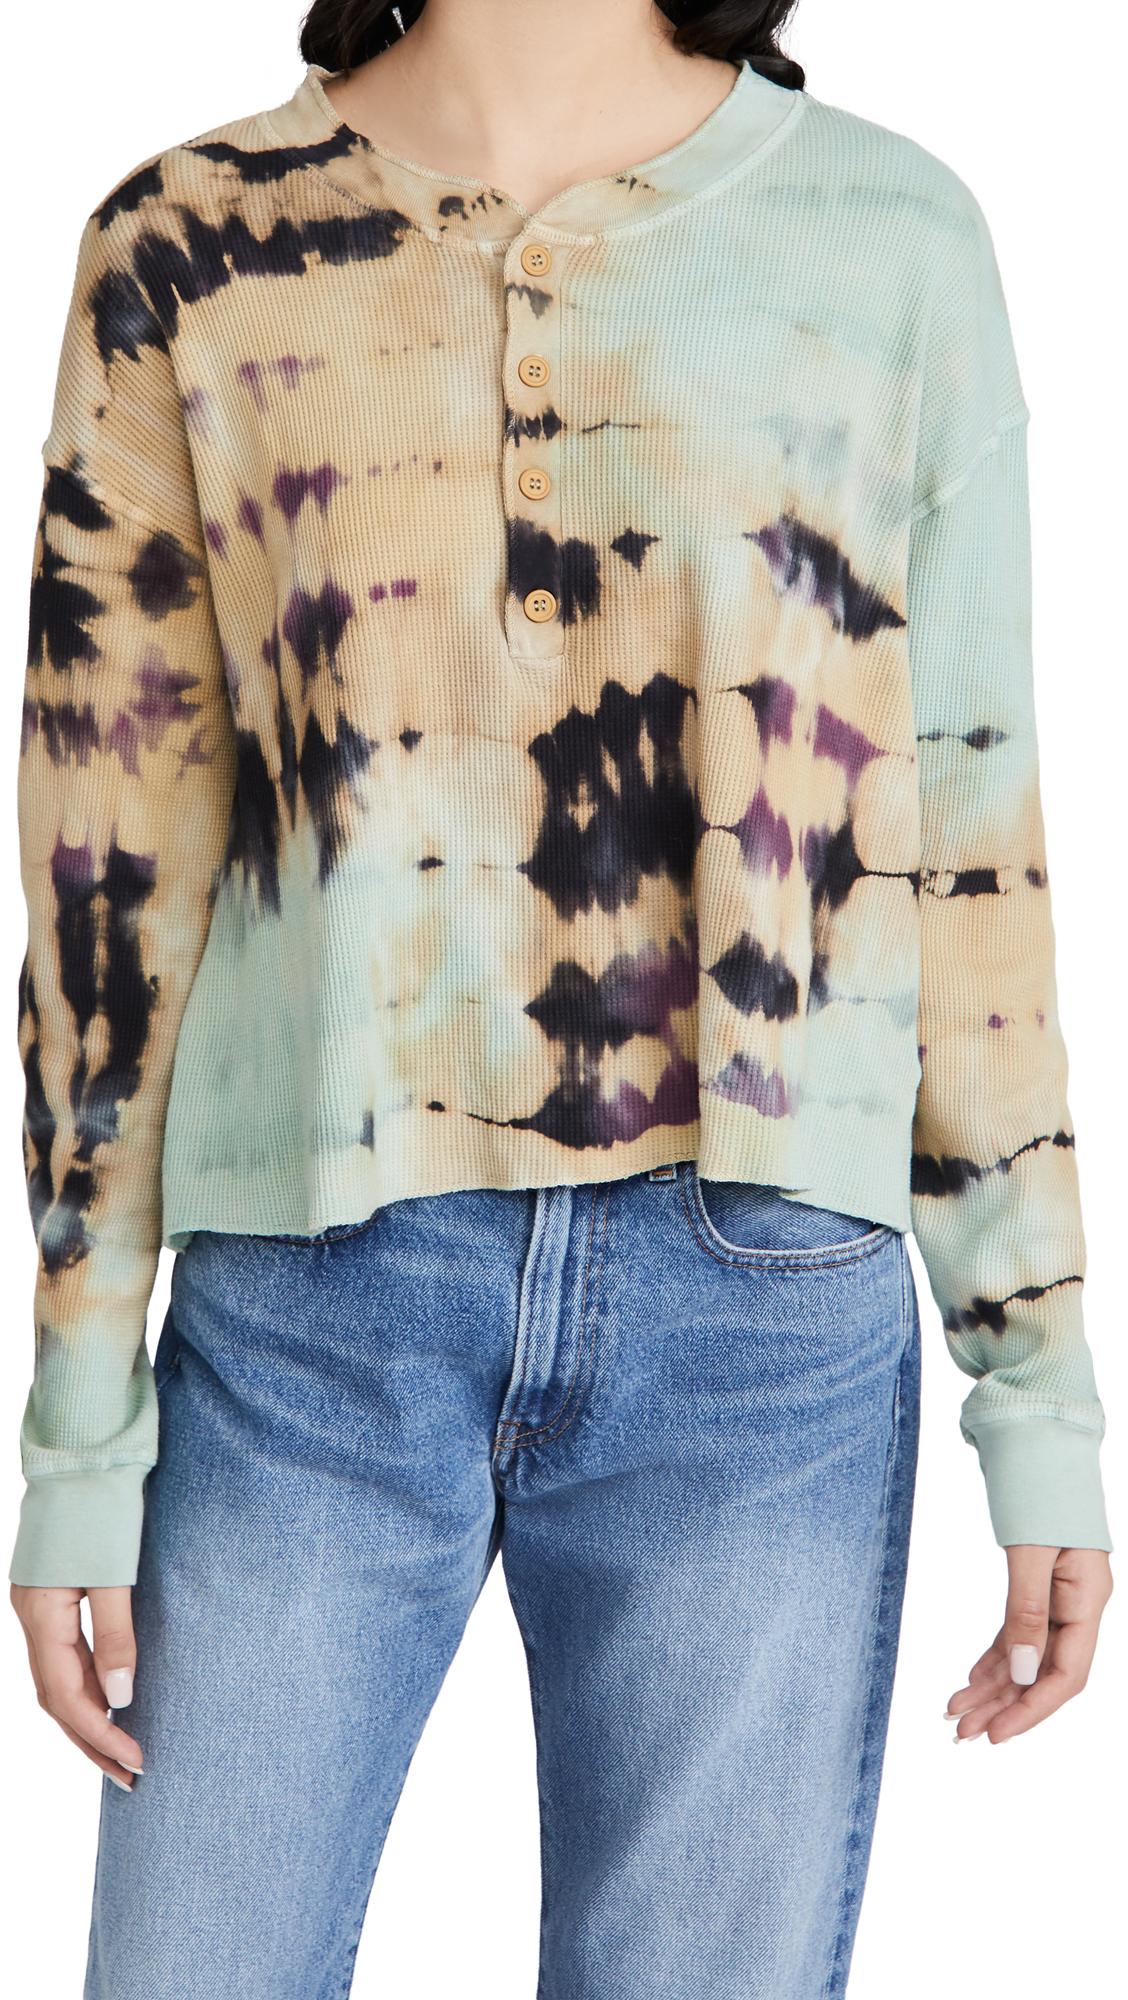 Daydreamer Clothing TIE DYE THERMAL HENLEY